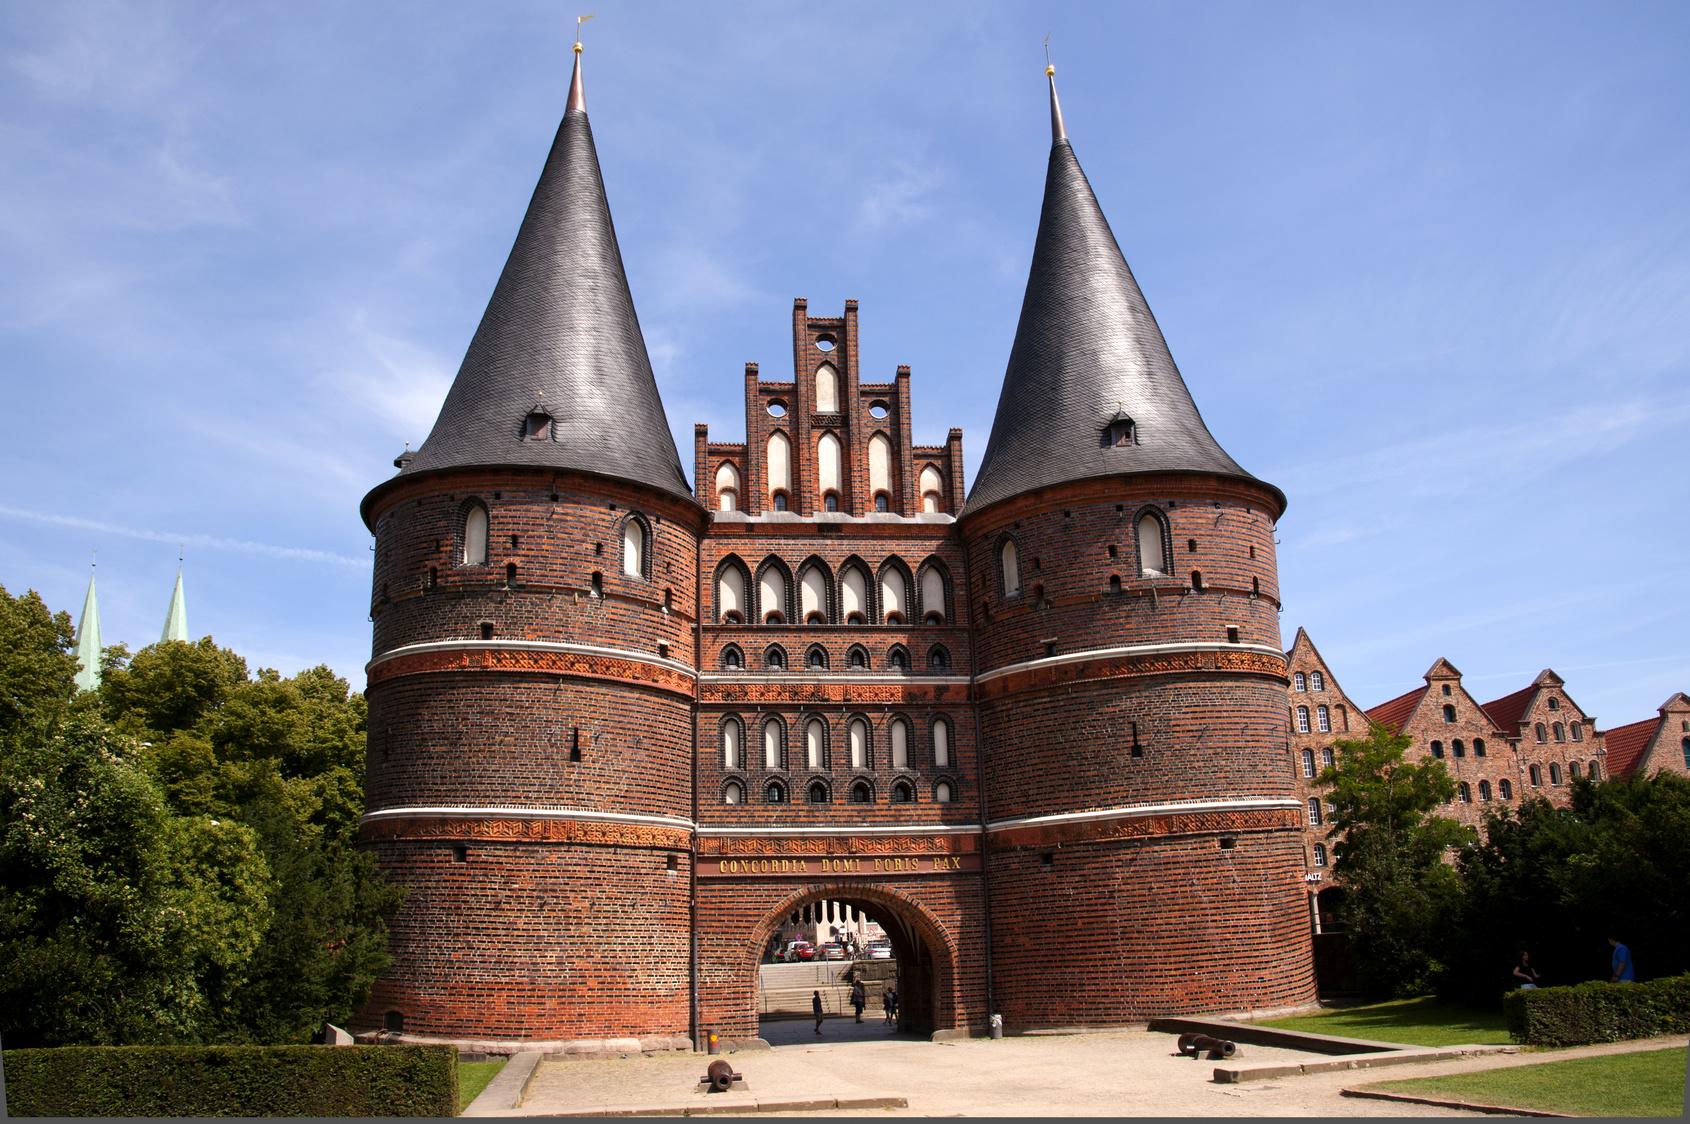 Entdeckungstour in Lübeck